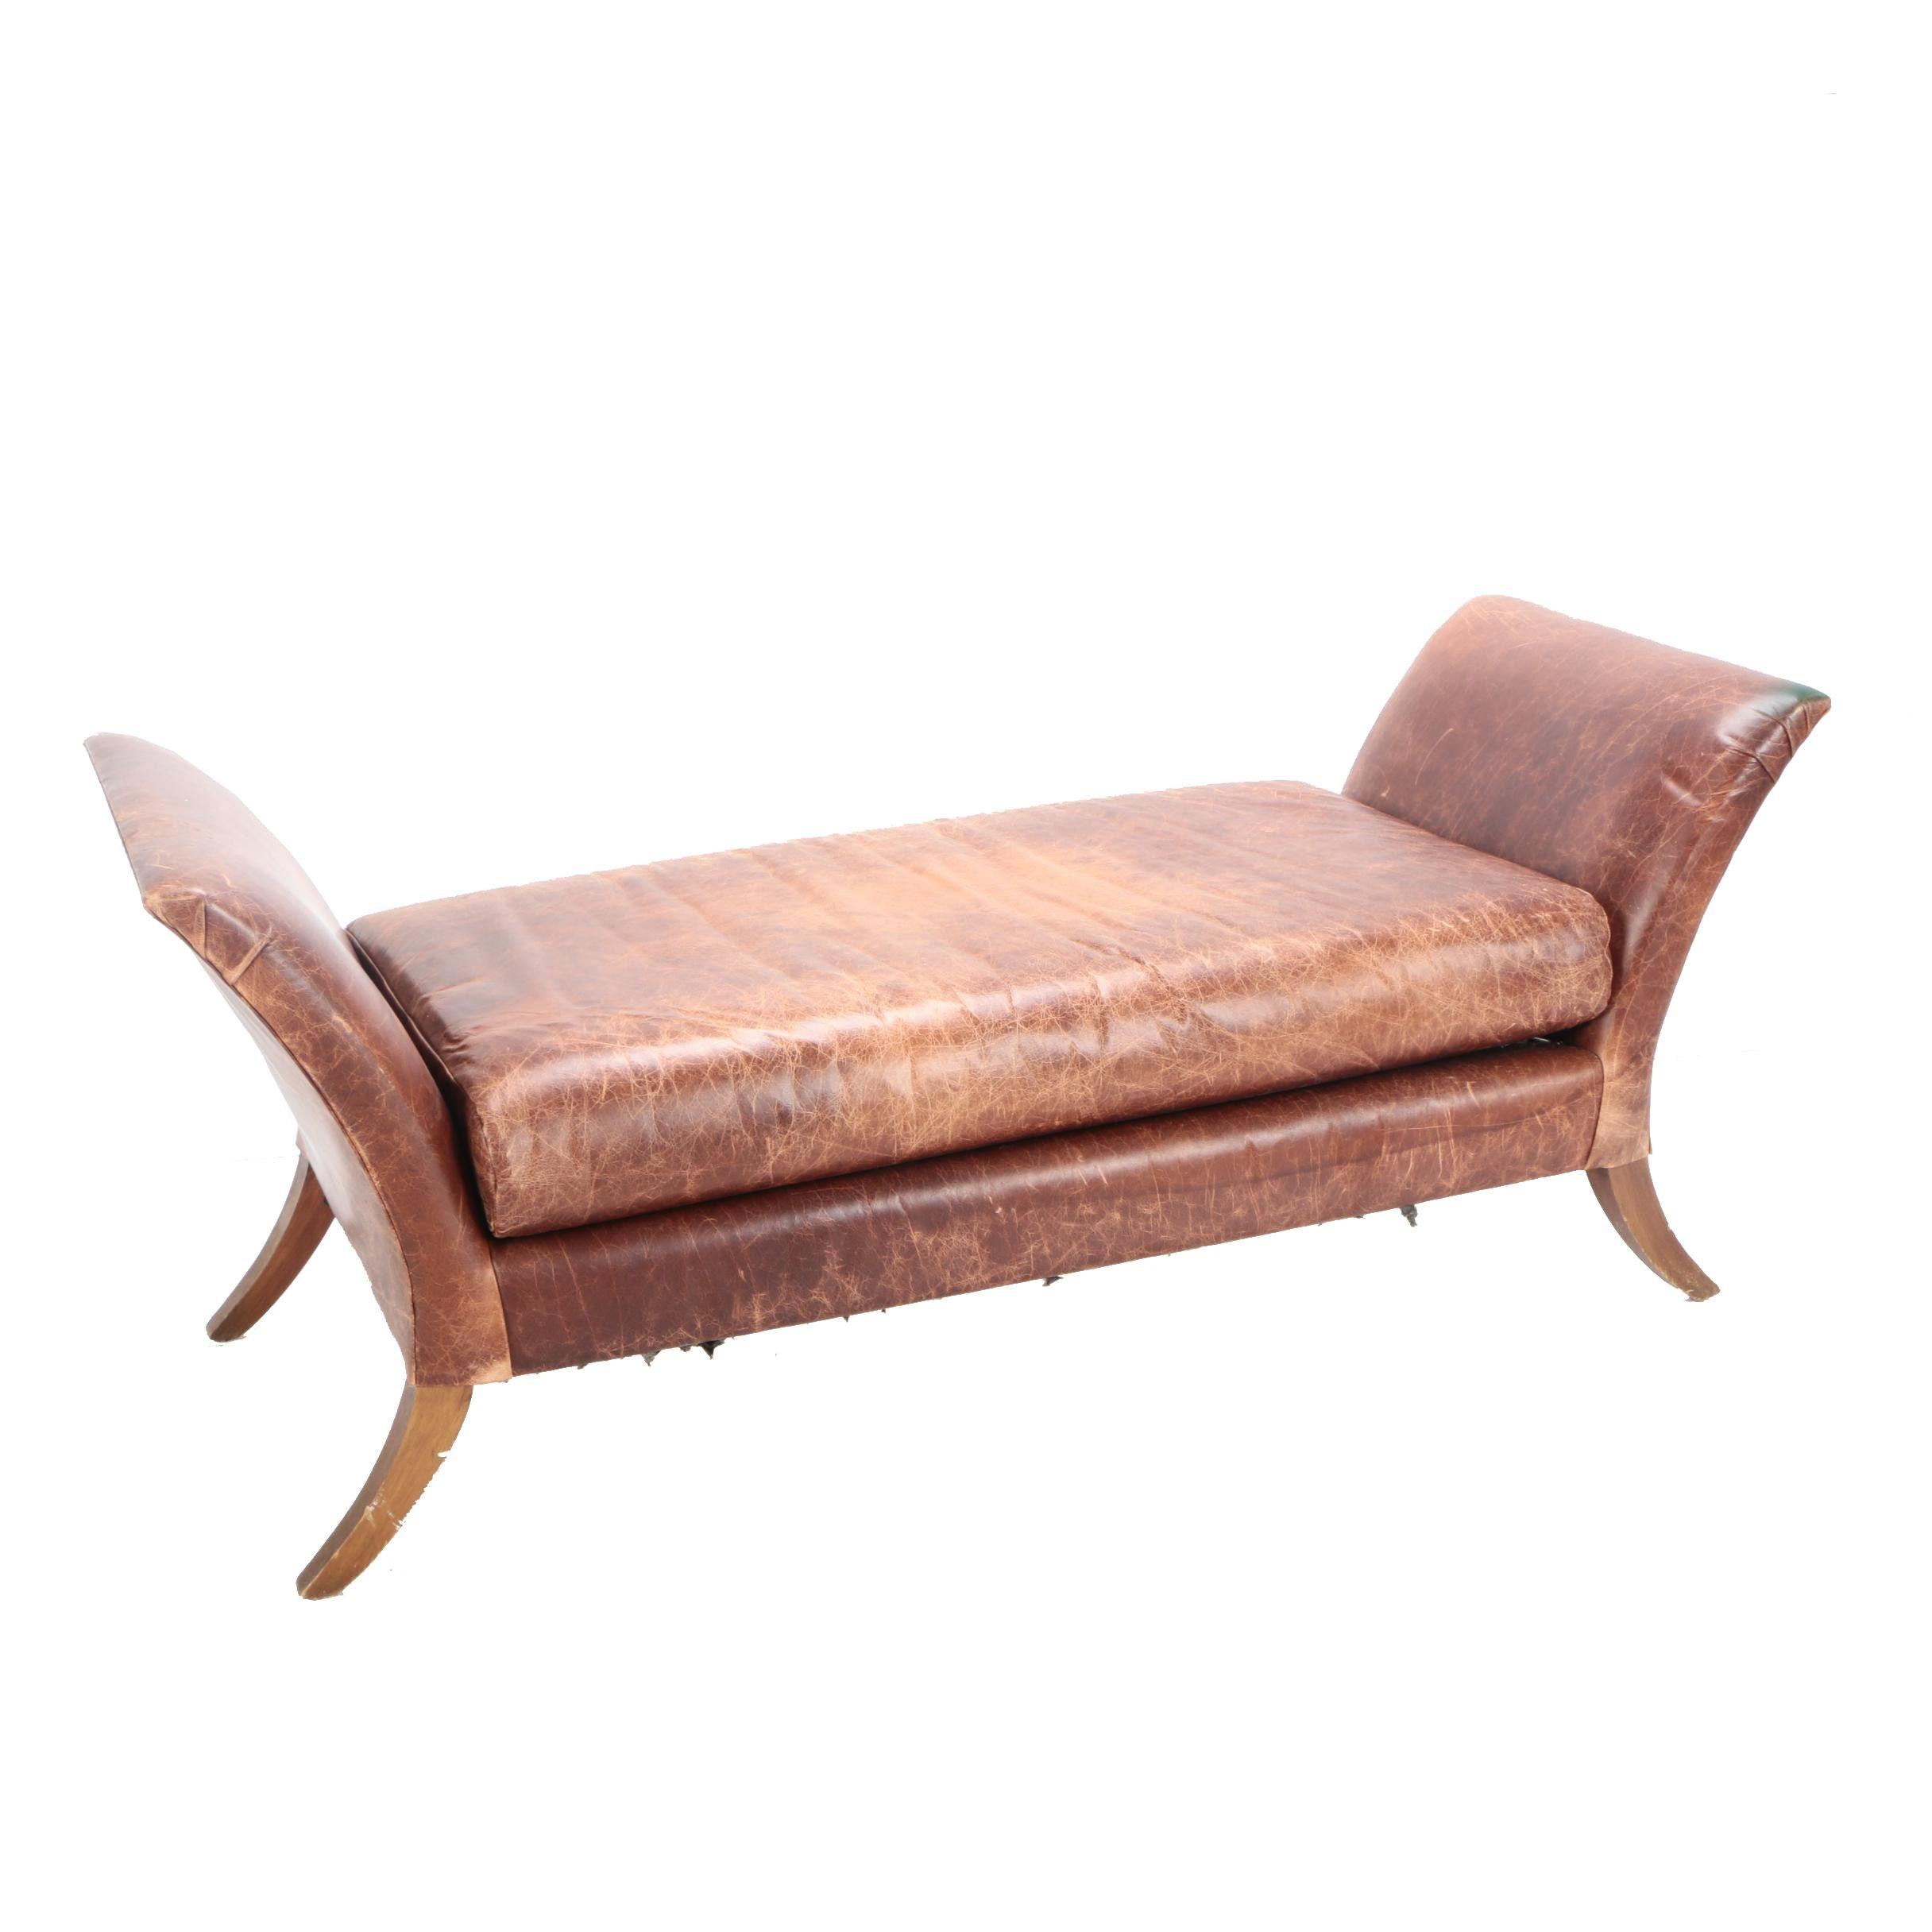 Vintage Leather Bench